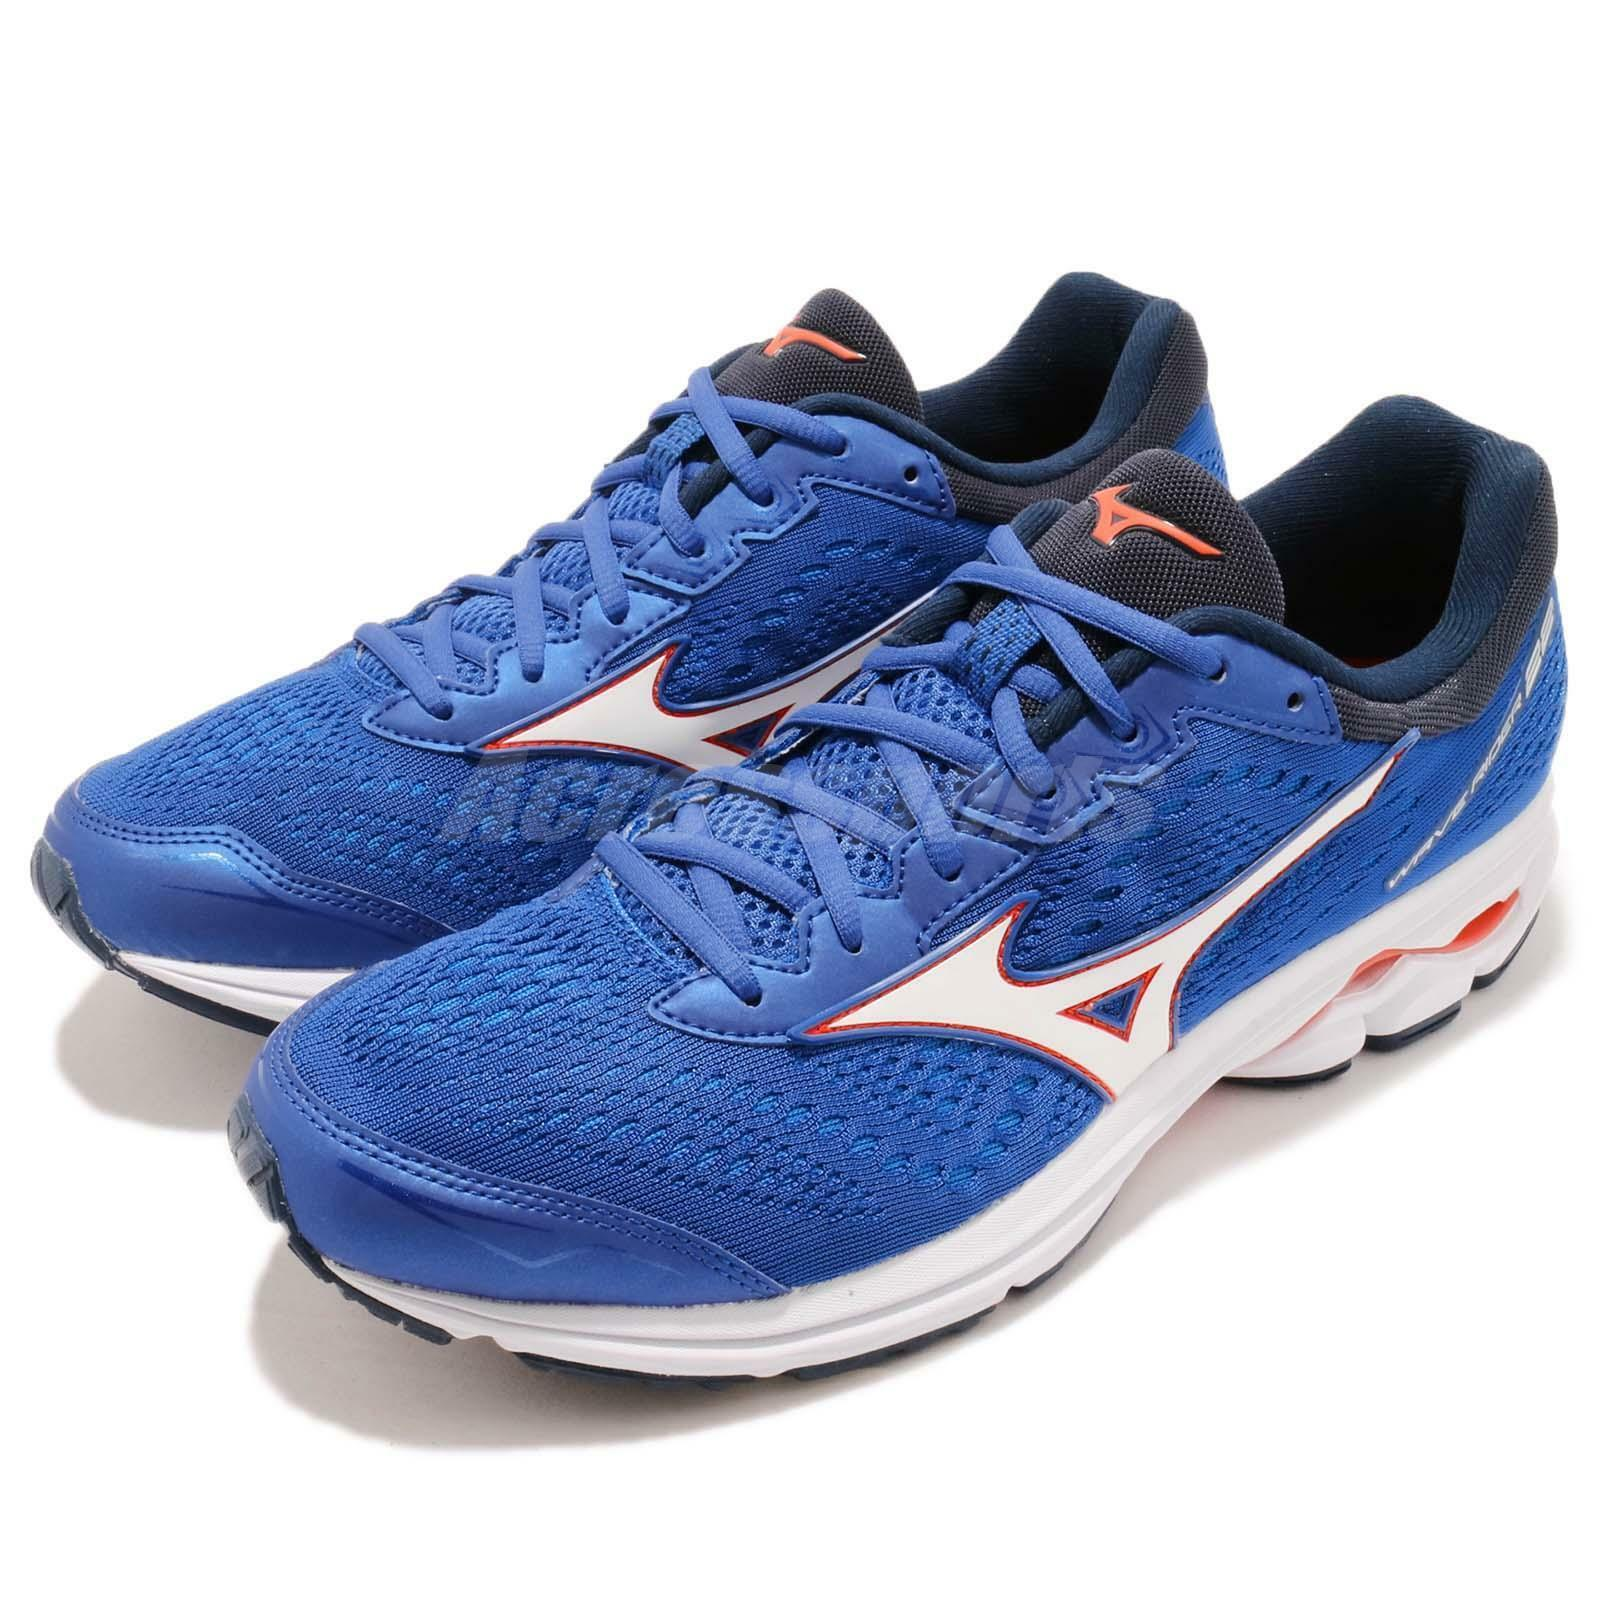 Mizuno Wave Rider 22 azul blanco rojo Men Men Men Running zapatos zapatillas J1GC1831-07 4dc2ed